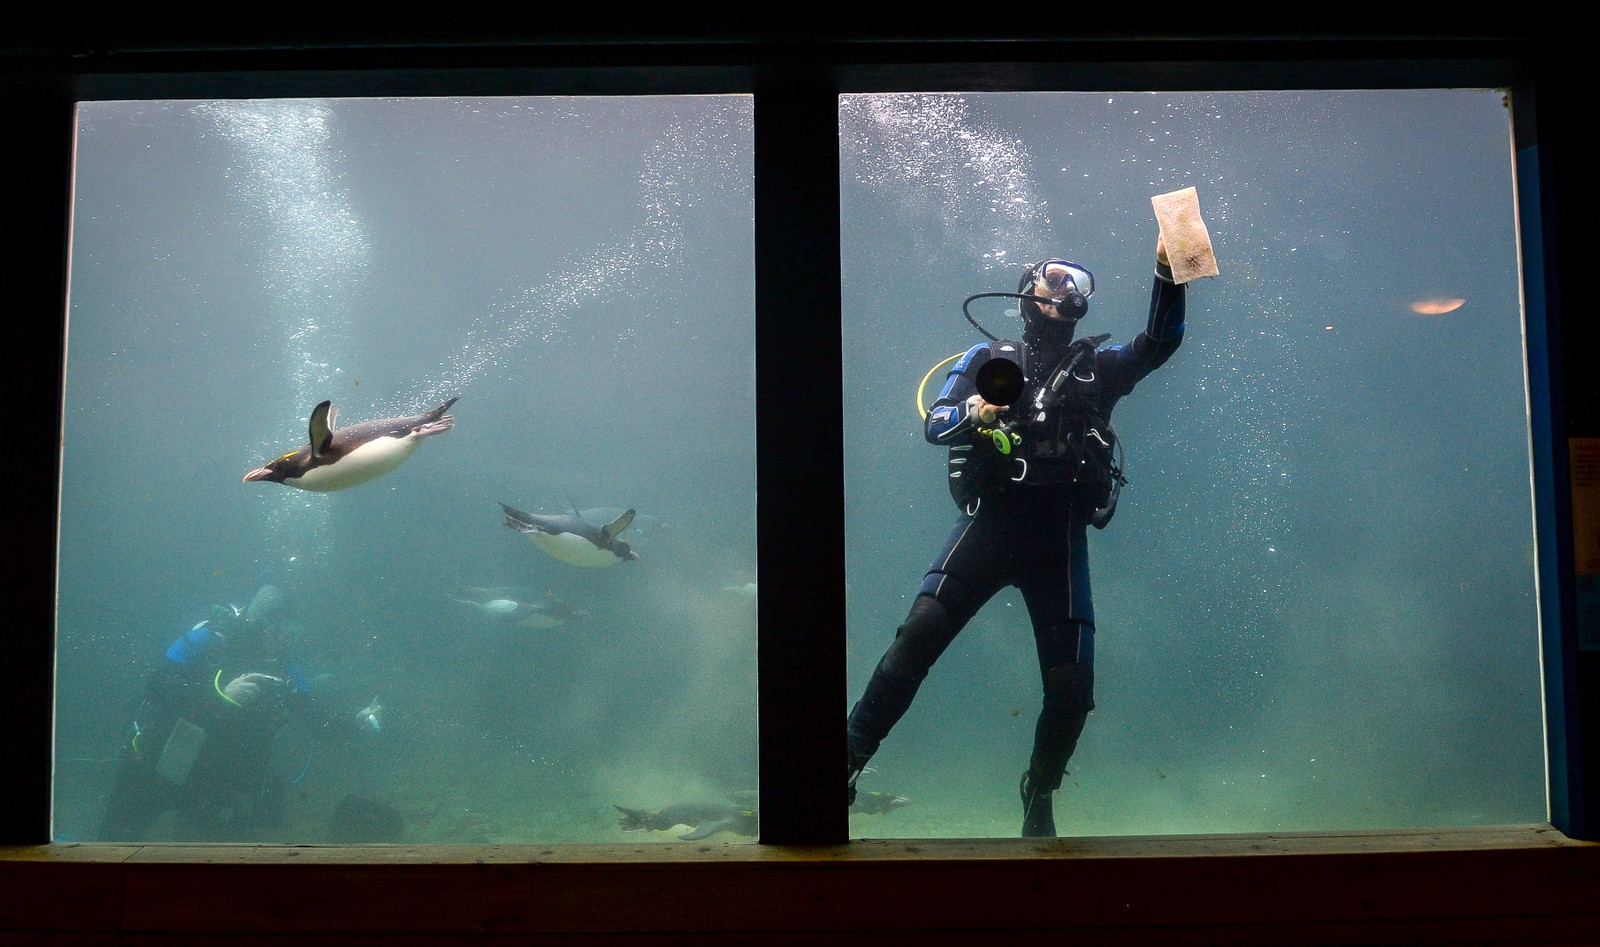 Gulltoppingviner svømmer rundt mens en dykker vasker akvariet til Living Coasts Zoo & Aquarium i Torquay i England.